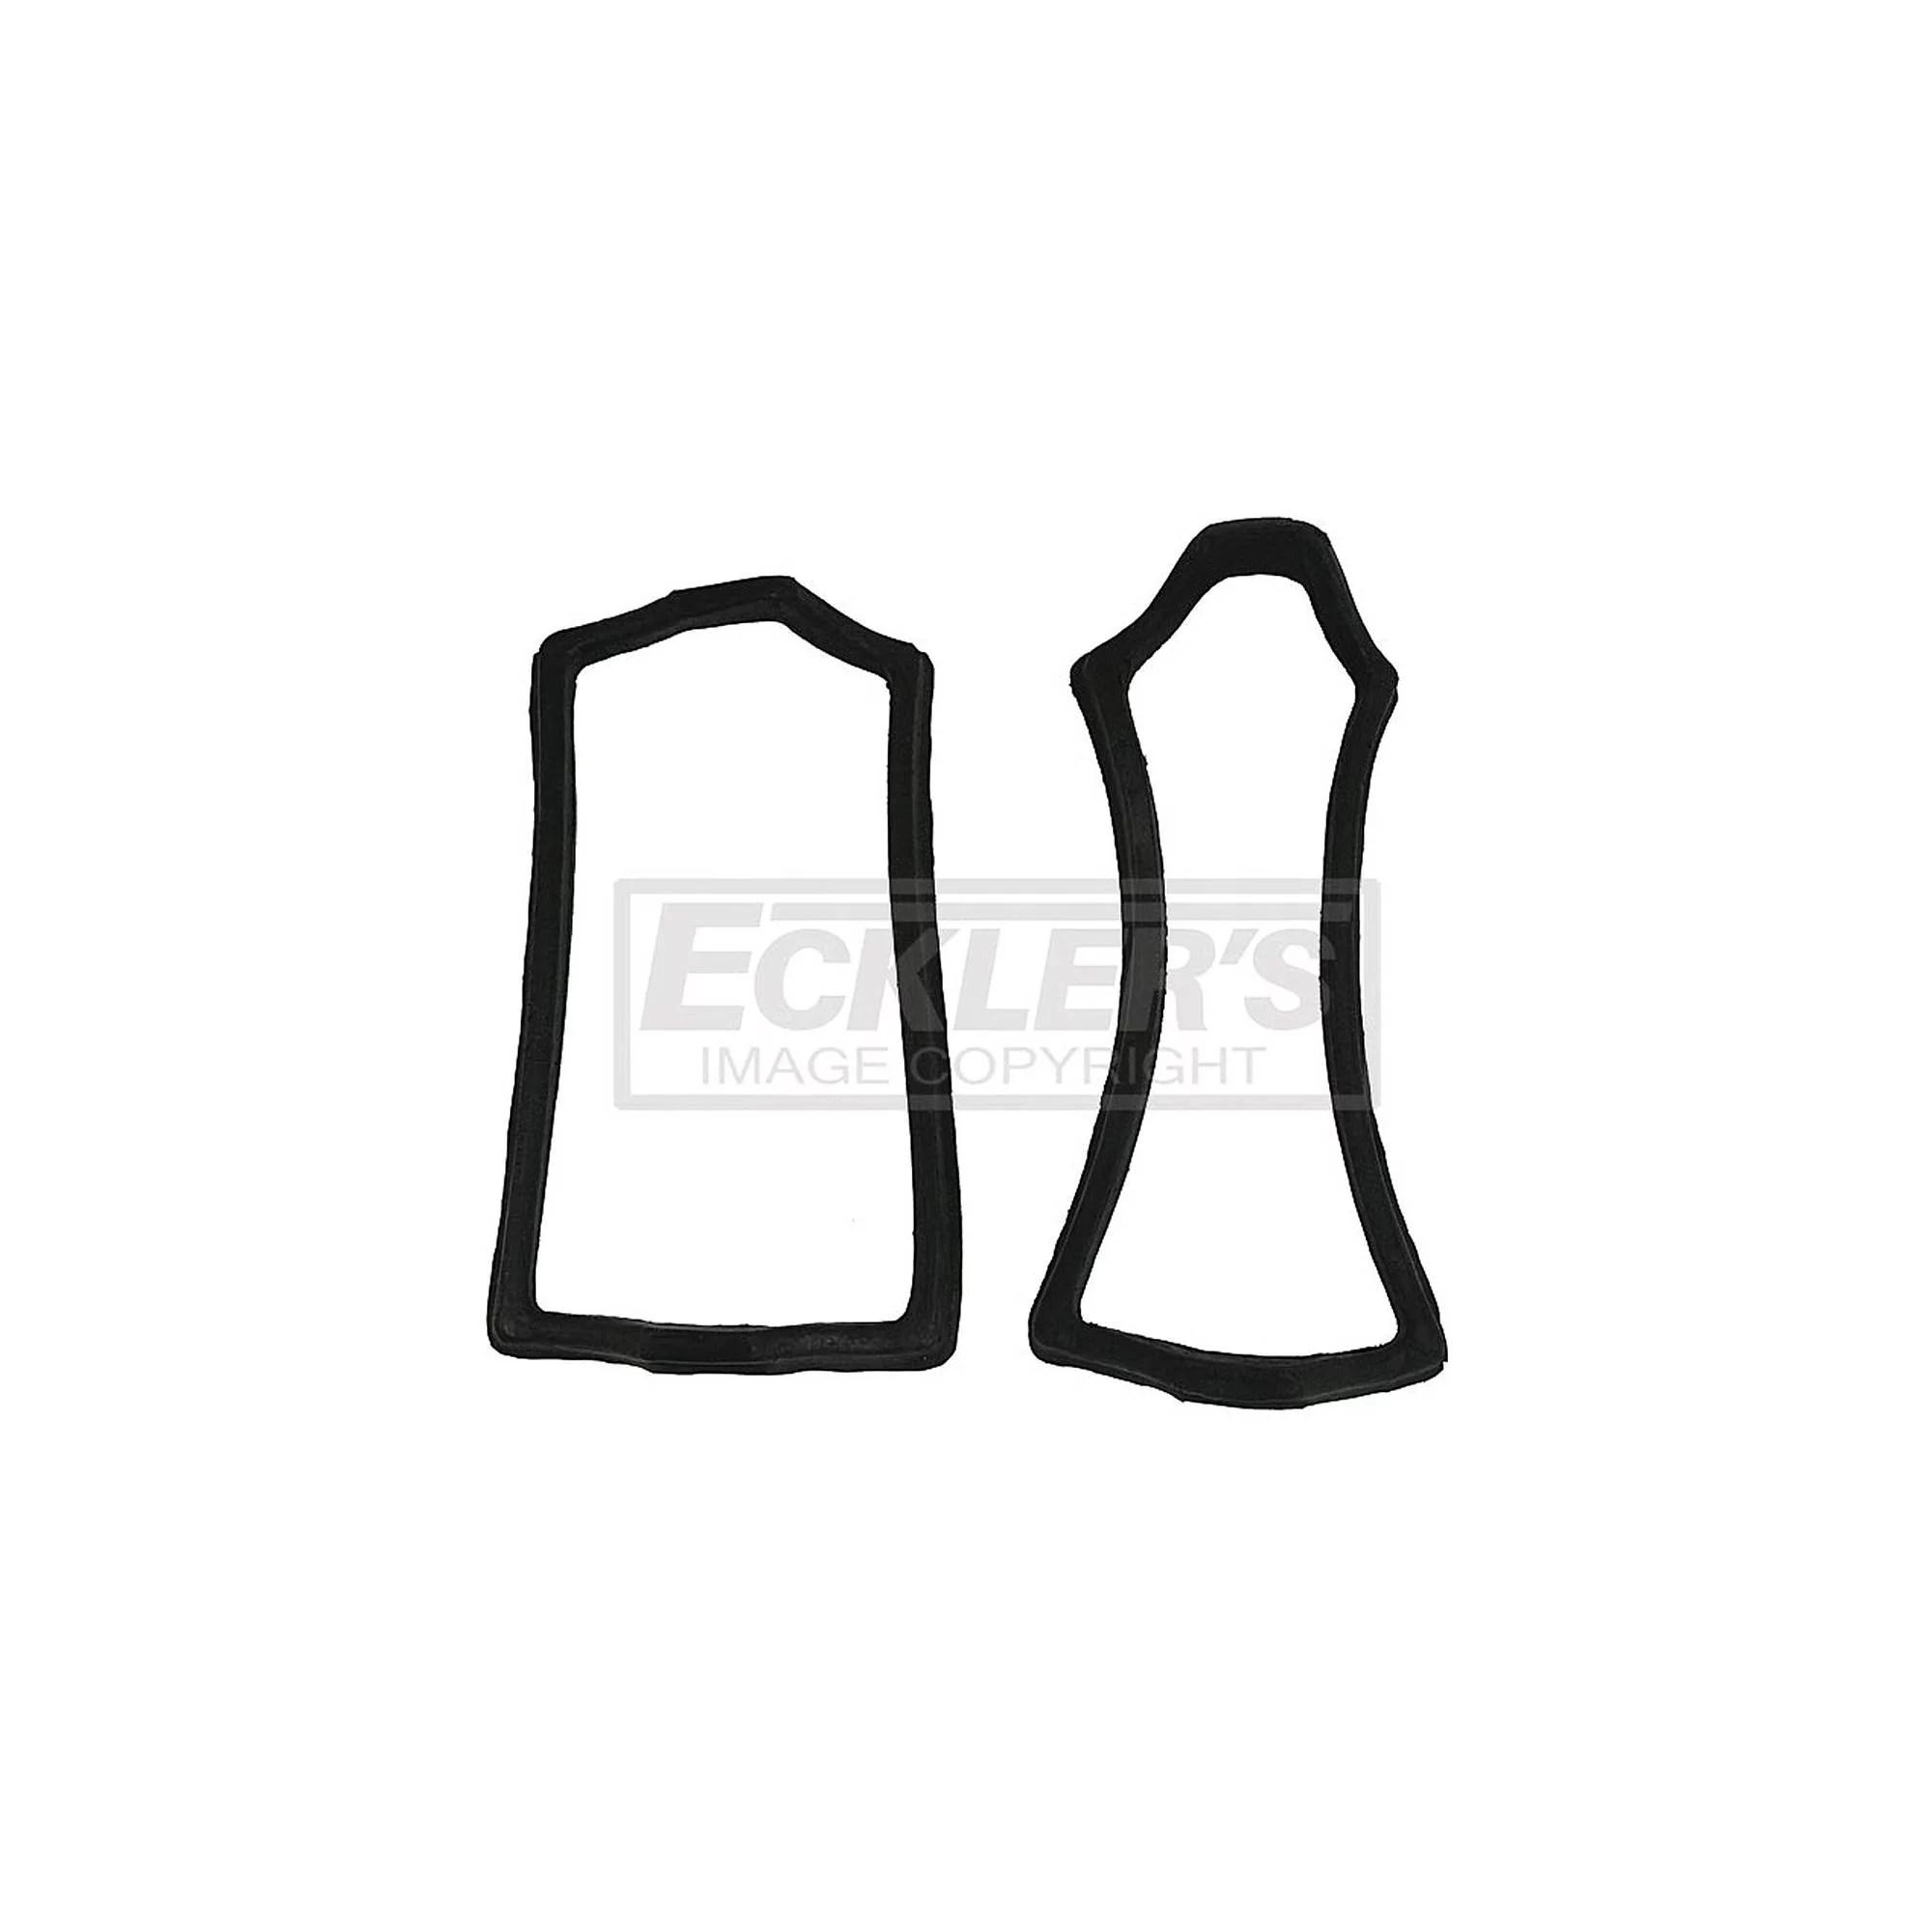 Eckler S Premier Products El Camino Taillight